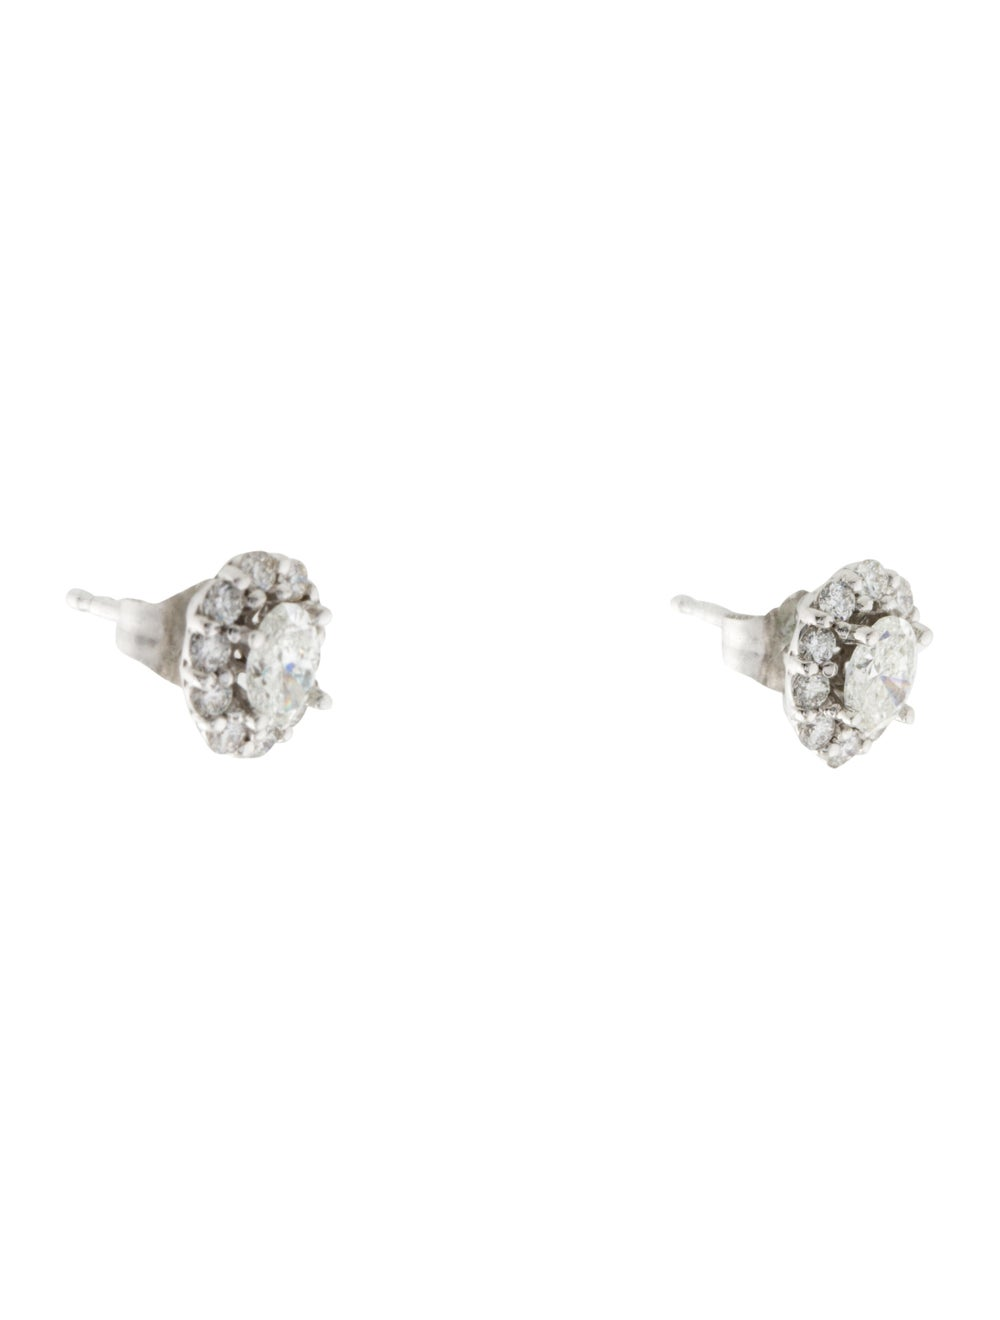 Earrings 14K Diamond Halo Stud Earrings White - image 3